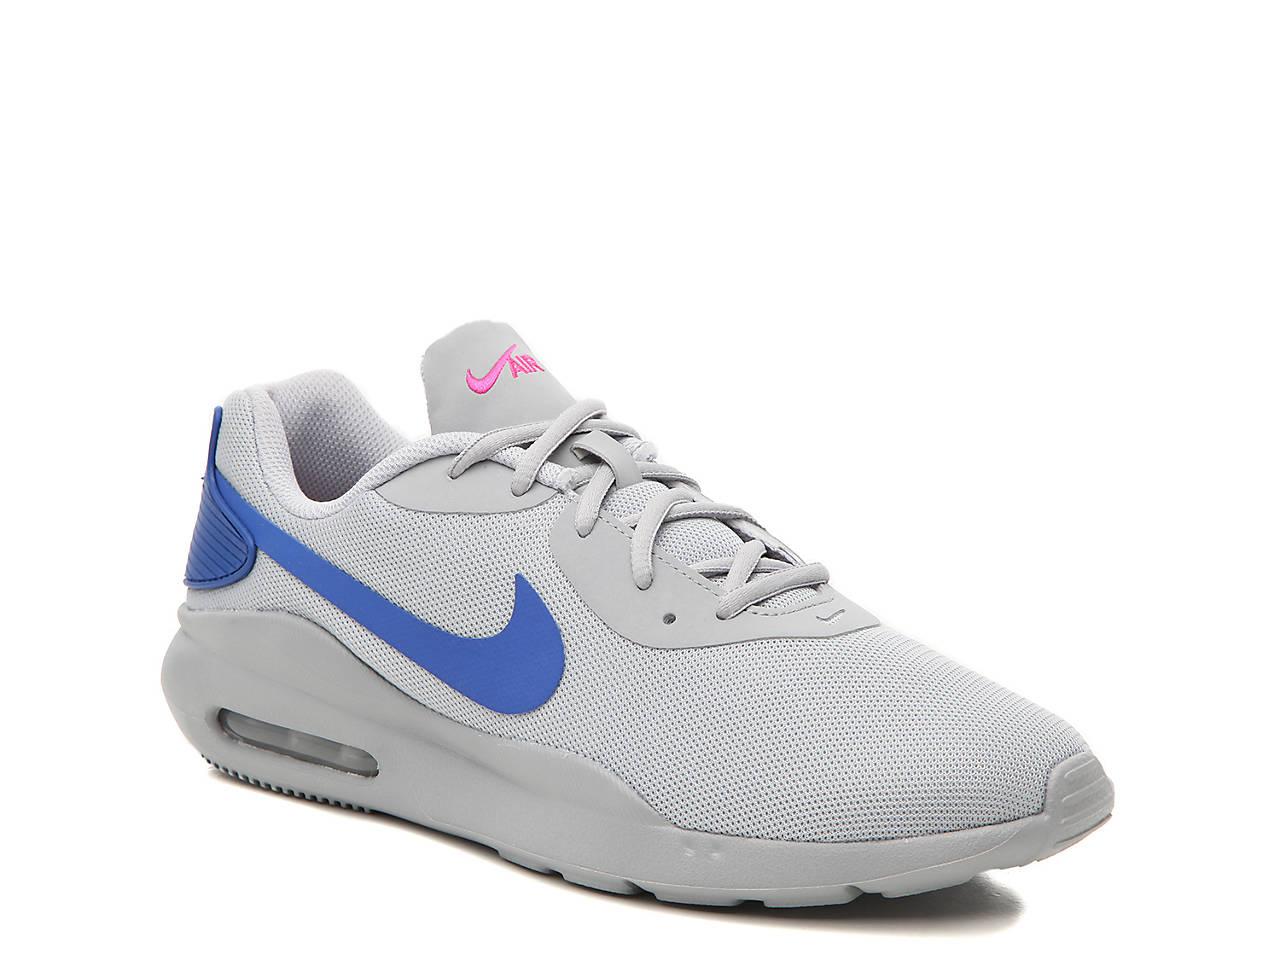 093168b0262f4 Nike Air Max Oketo Sneaker - Men's Men's Shoes | DSW